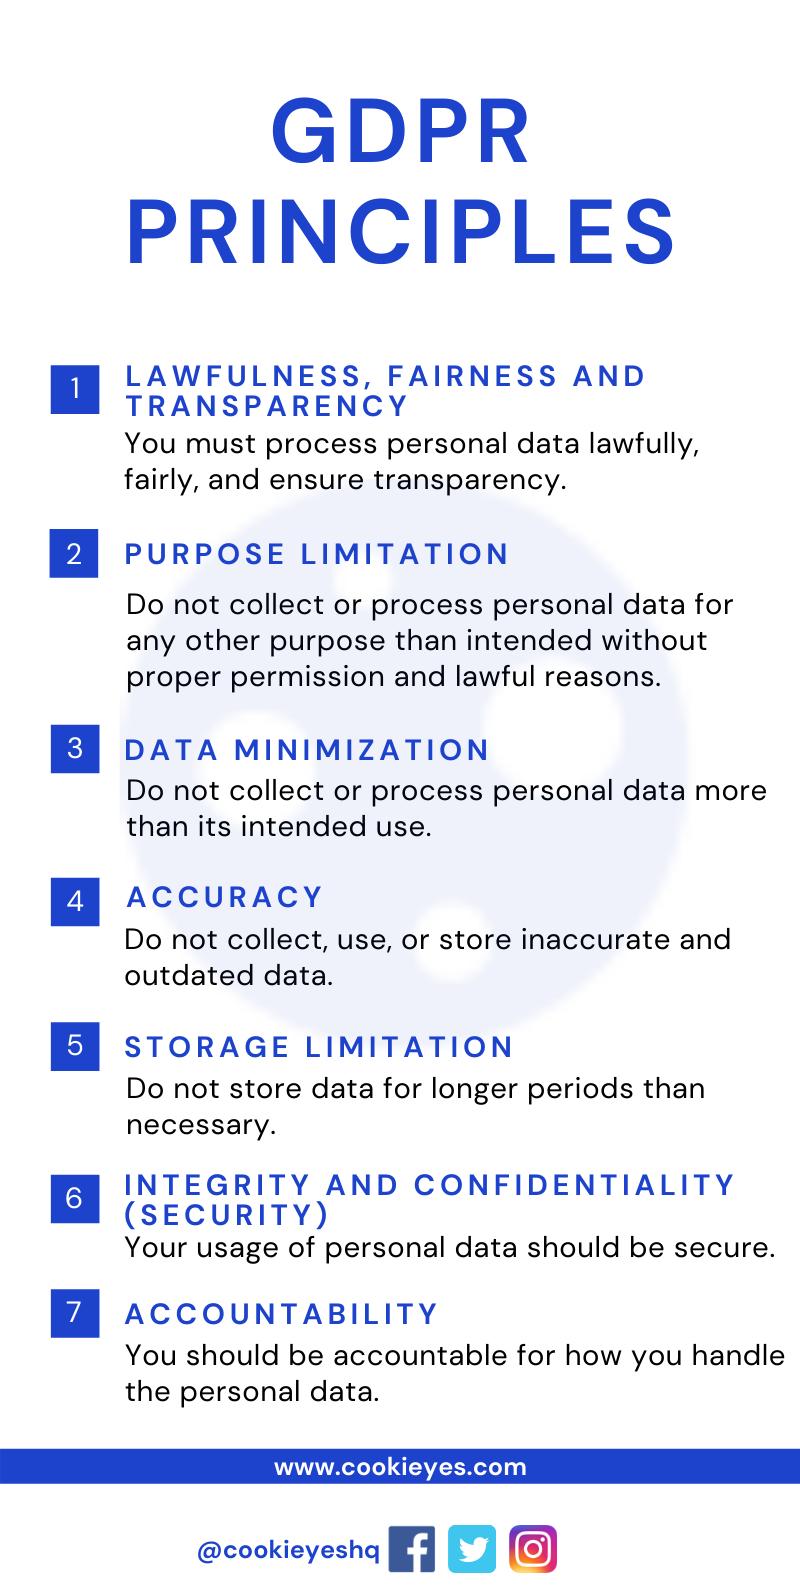 GDPR customer data - principles